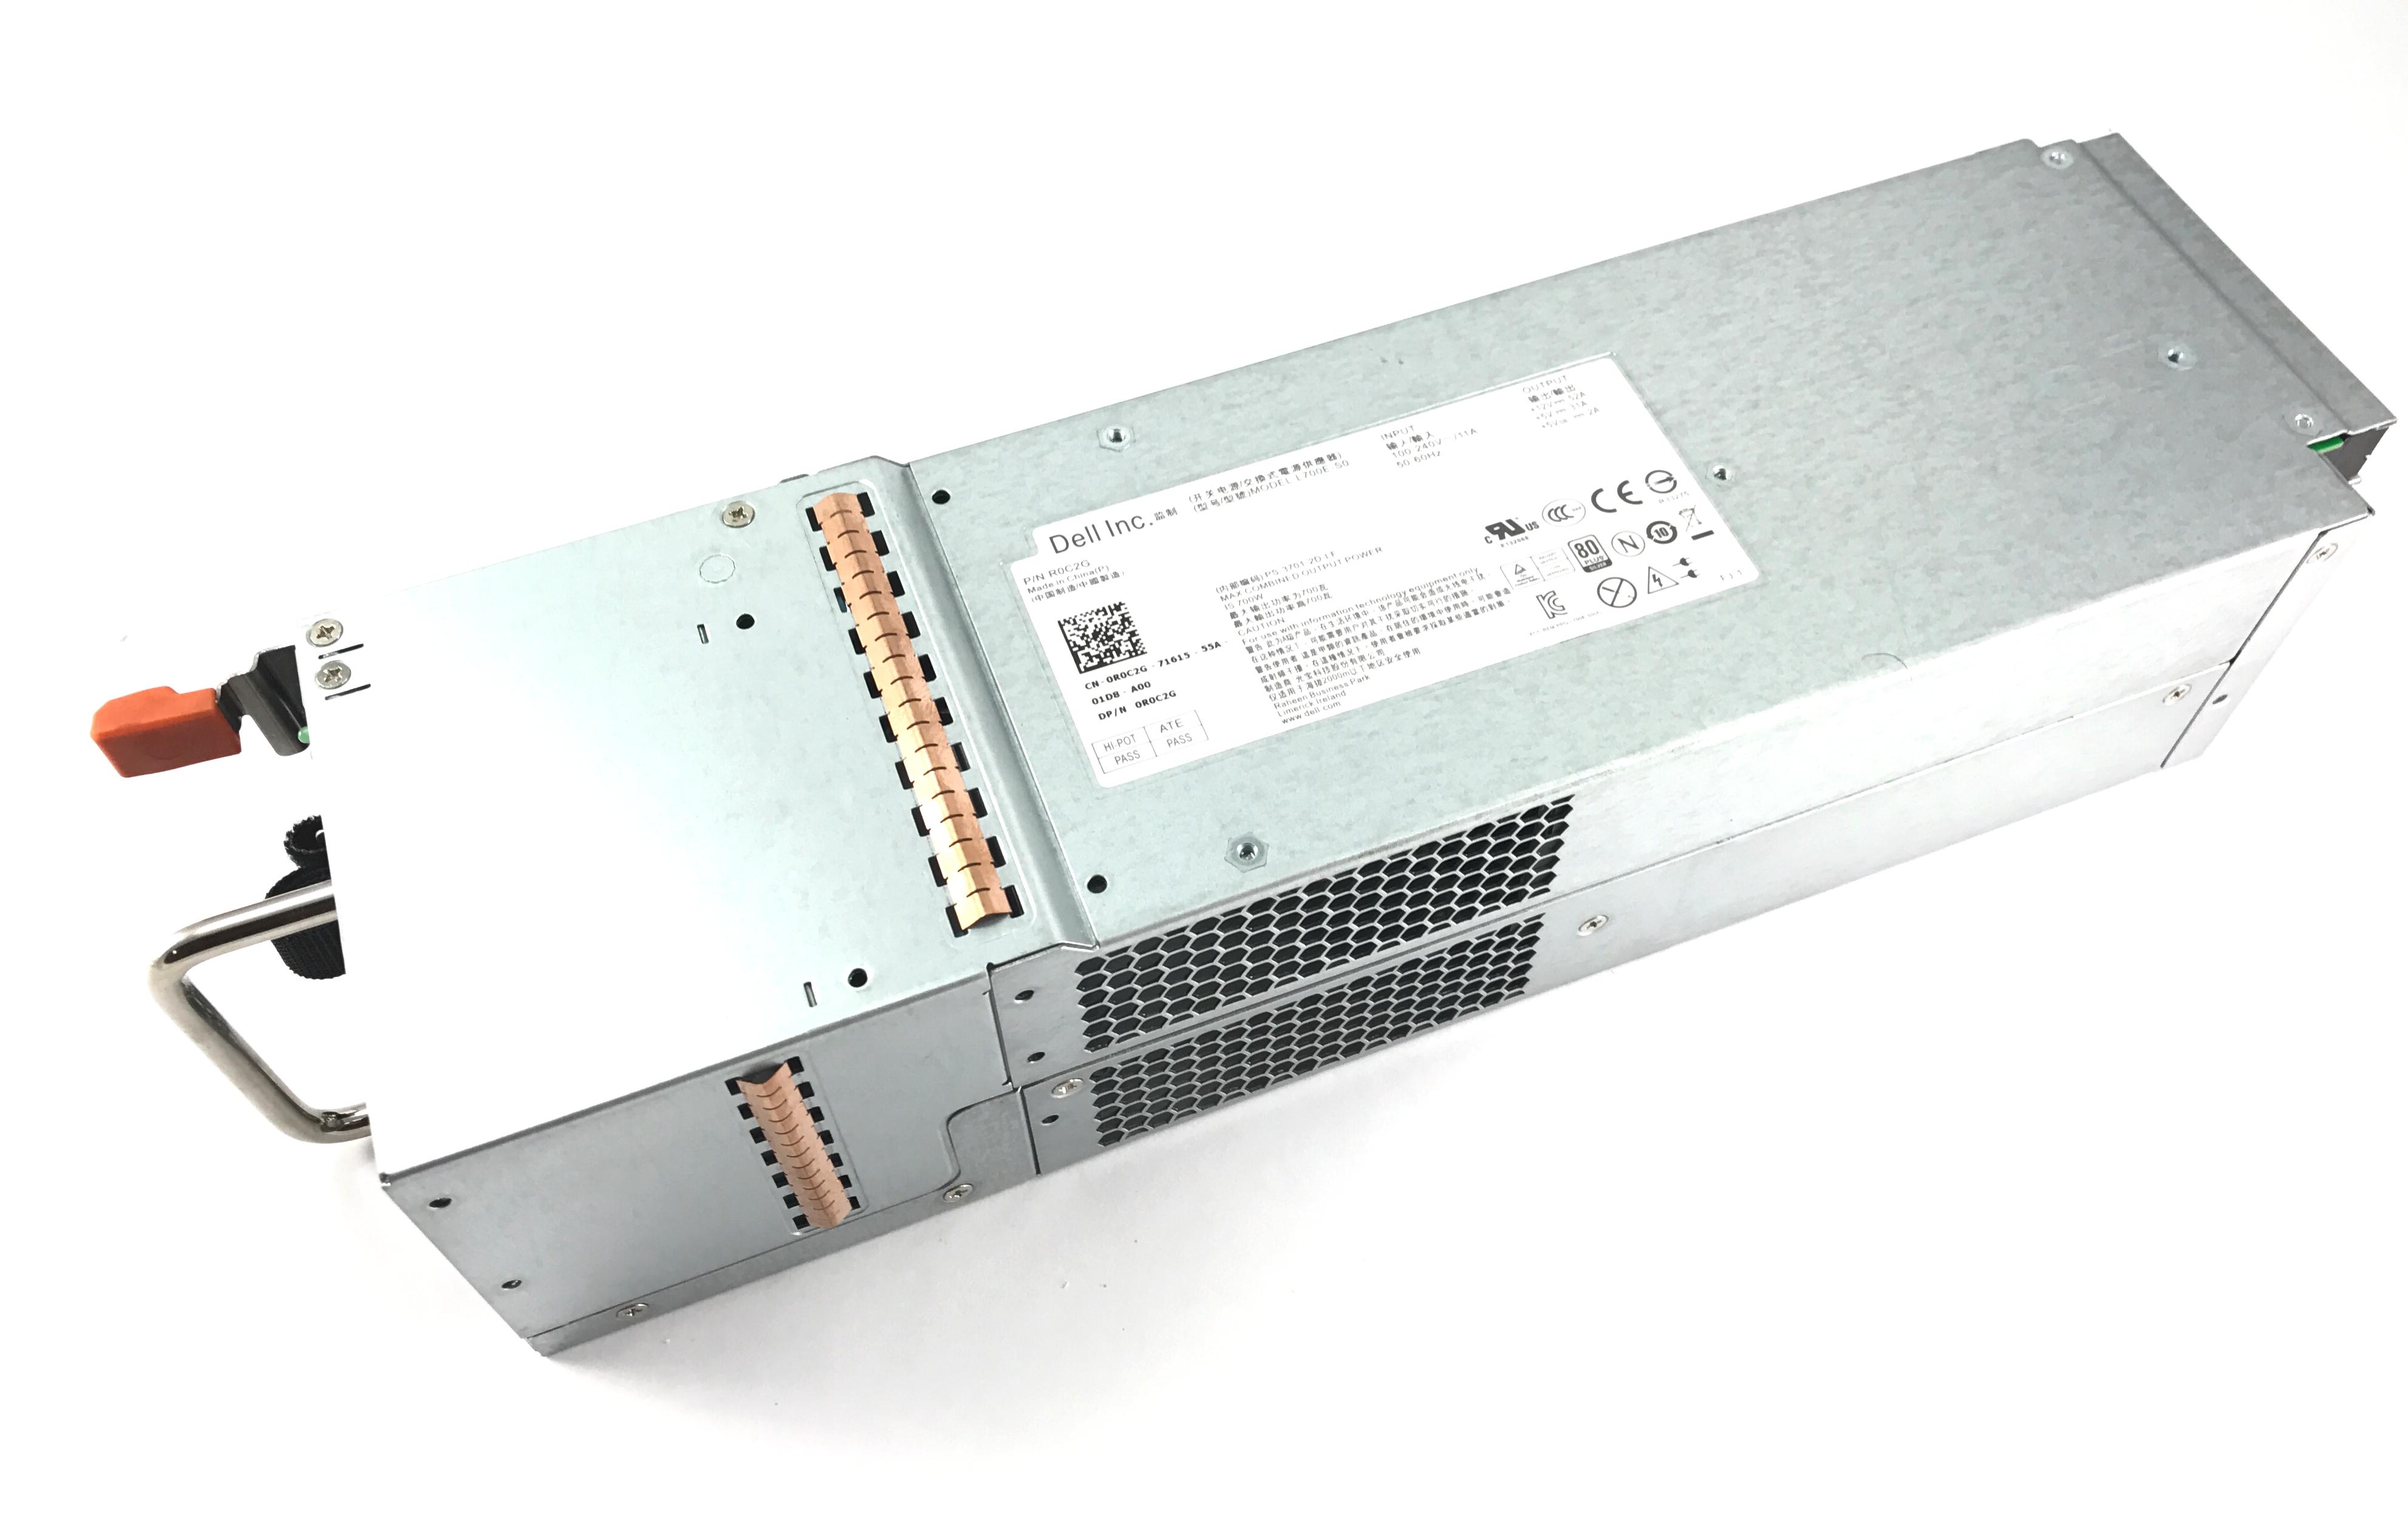 Dell EqualLogic L700e-s0 R0c2g 700w Server Power Supply | eBay